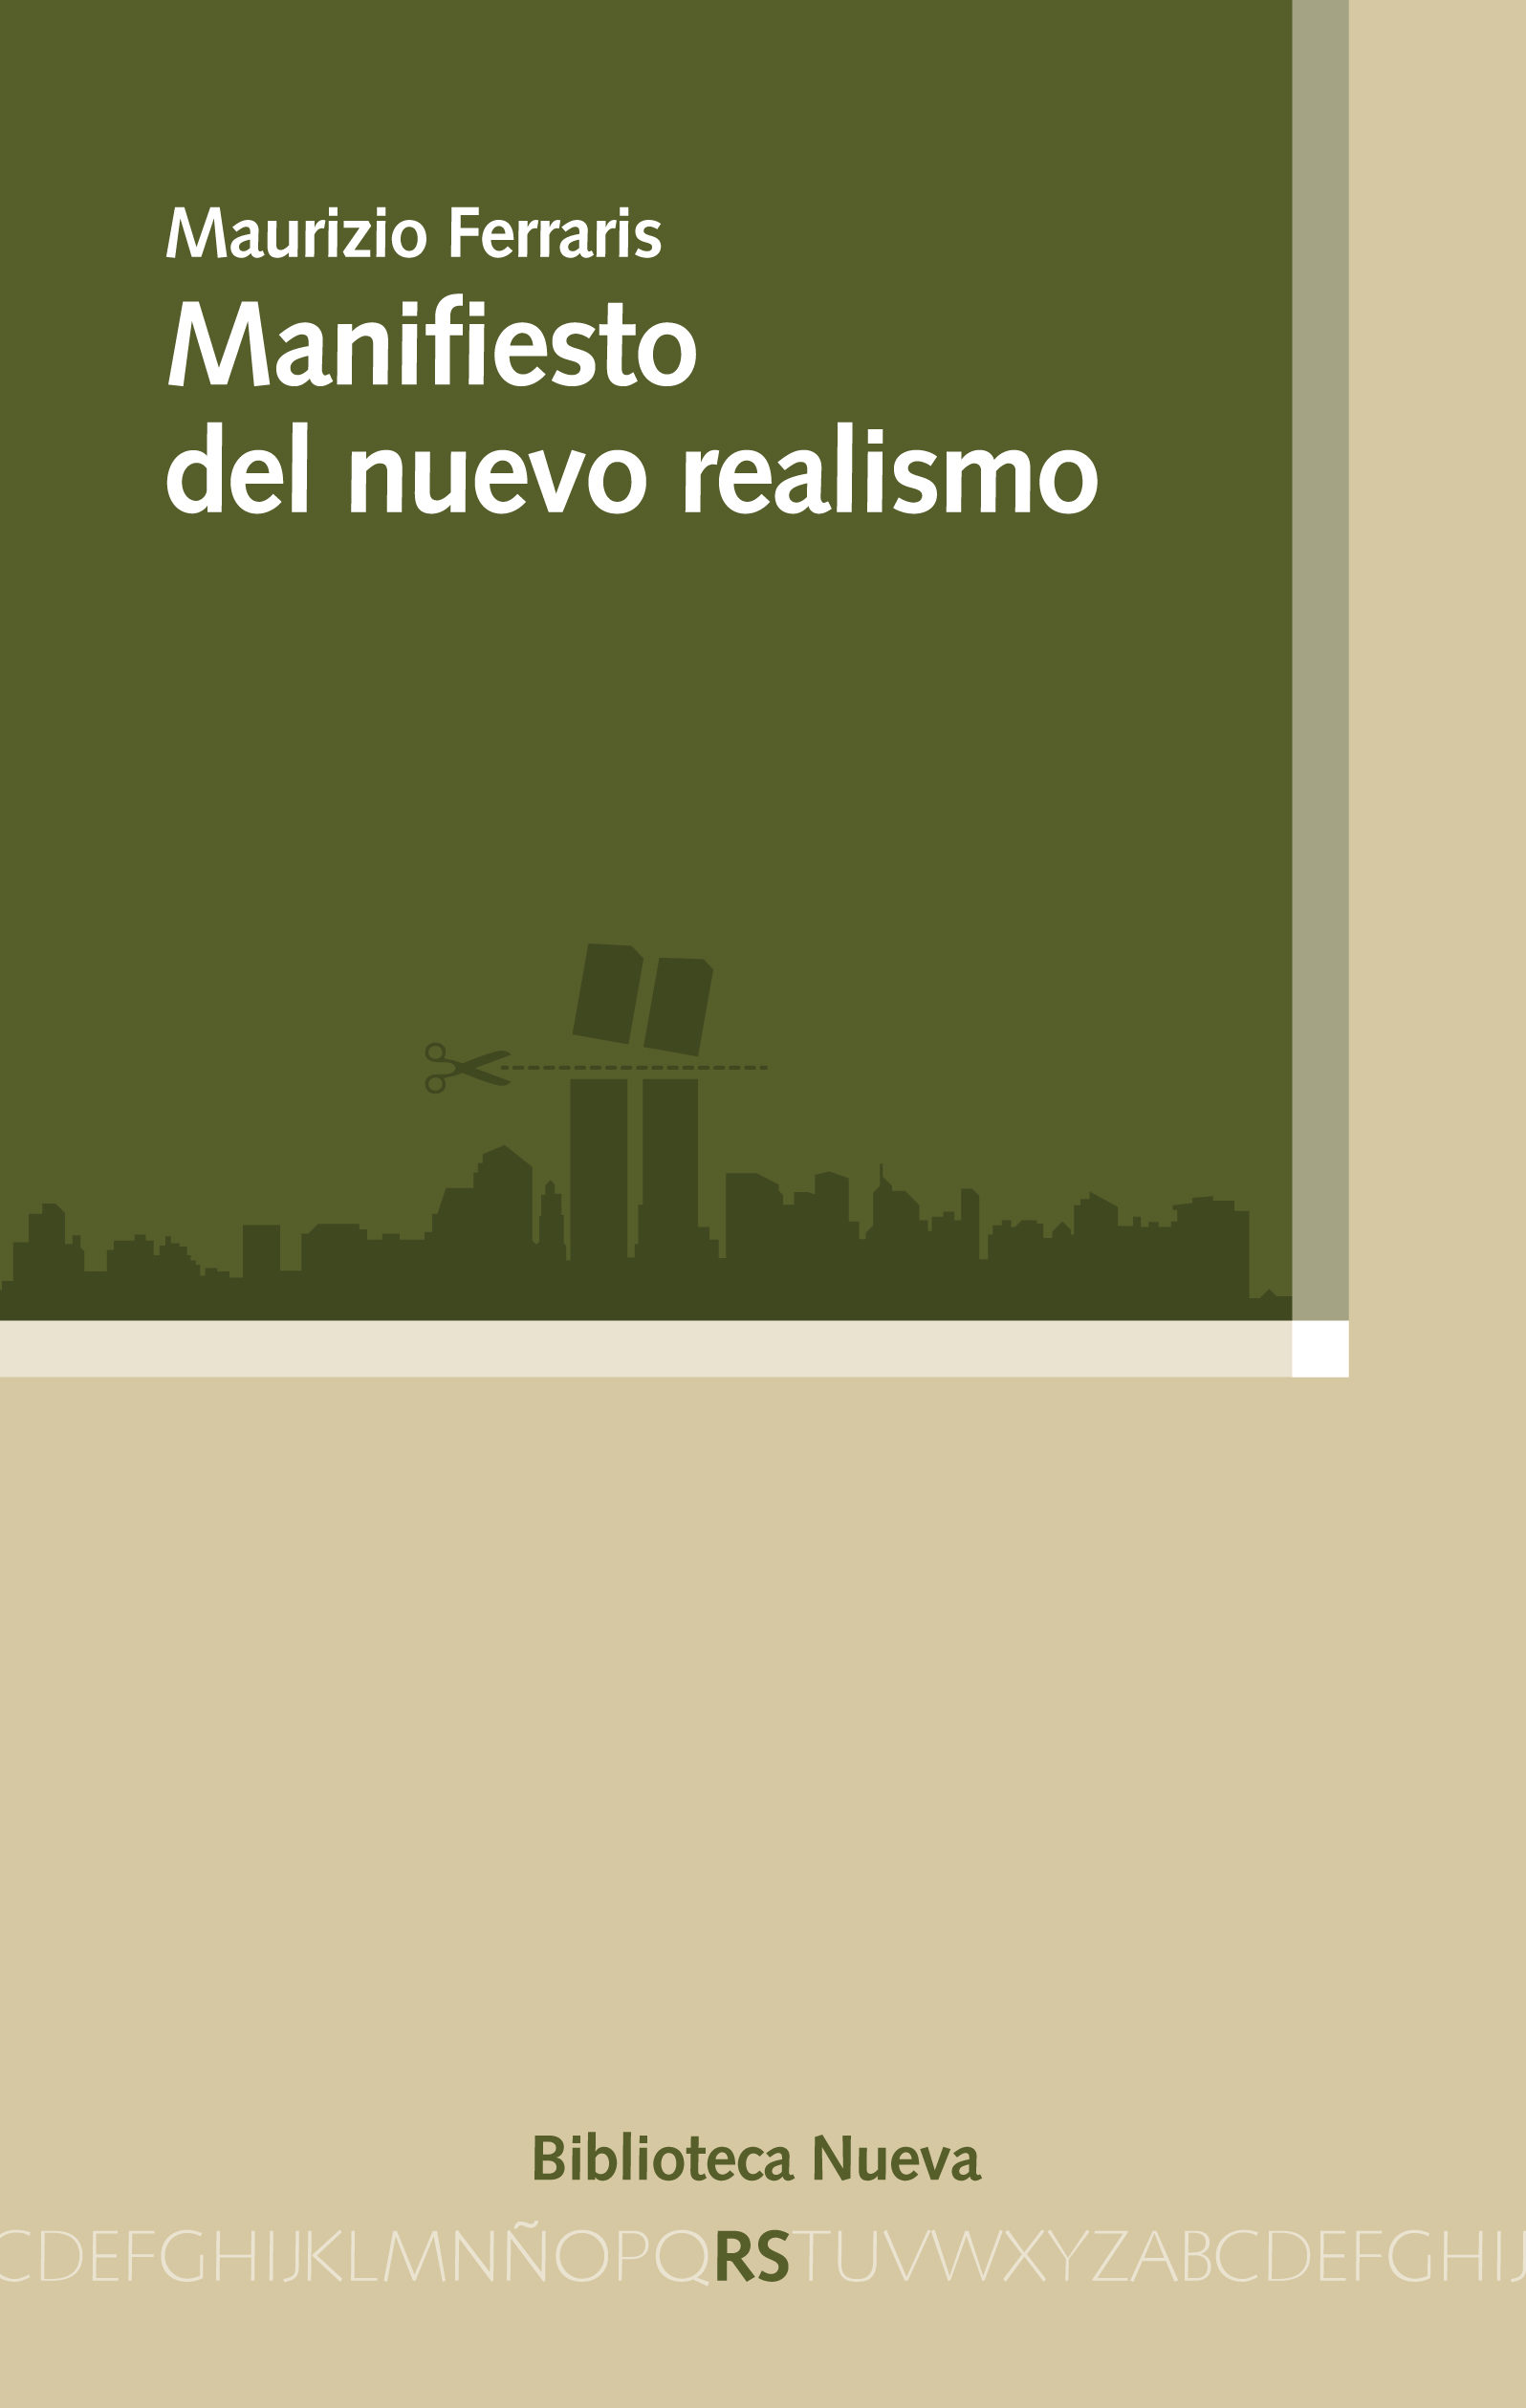 Manifiesto Del Nuevo Realismo por Maurizio Ferraris